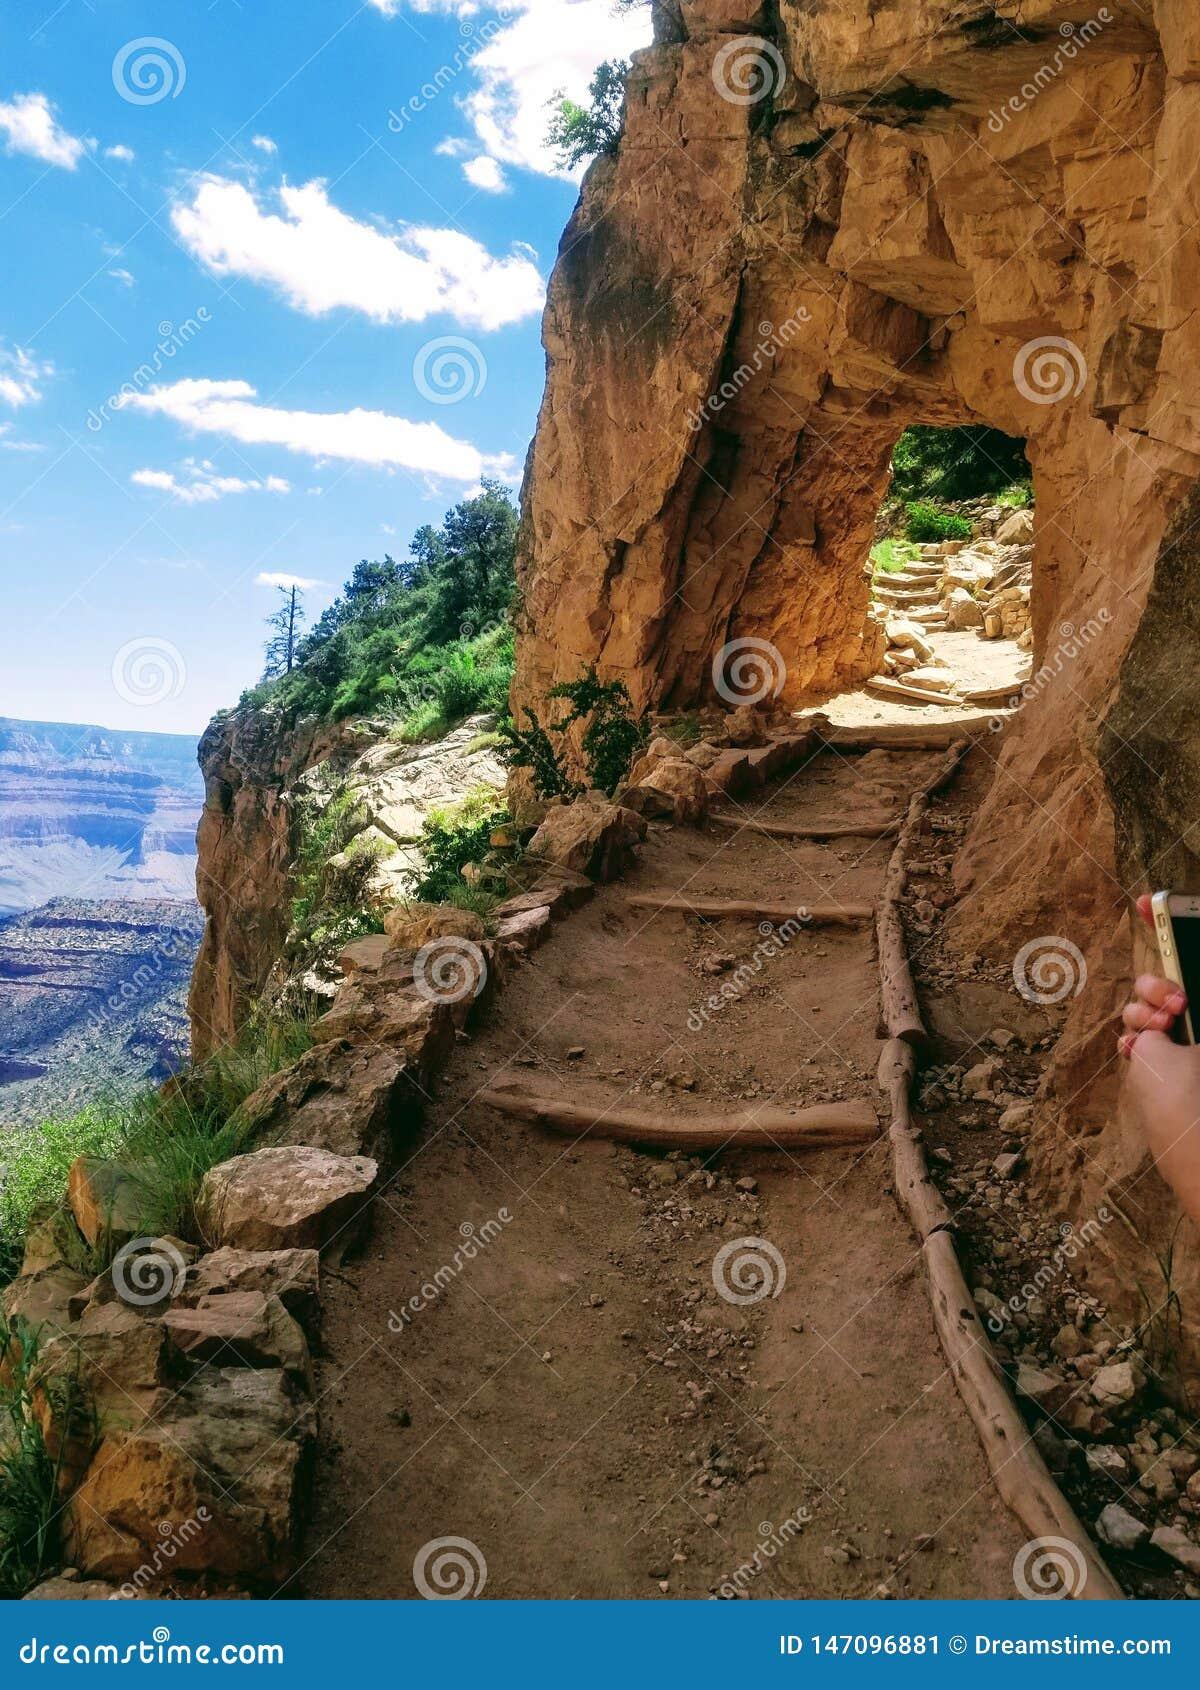 Grand Canyon de exploraci?n Arizona los E.E.U.U.